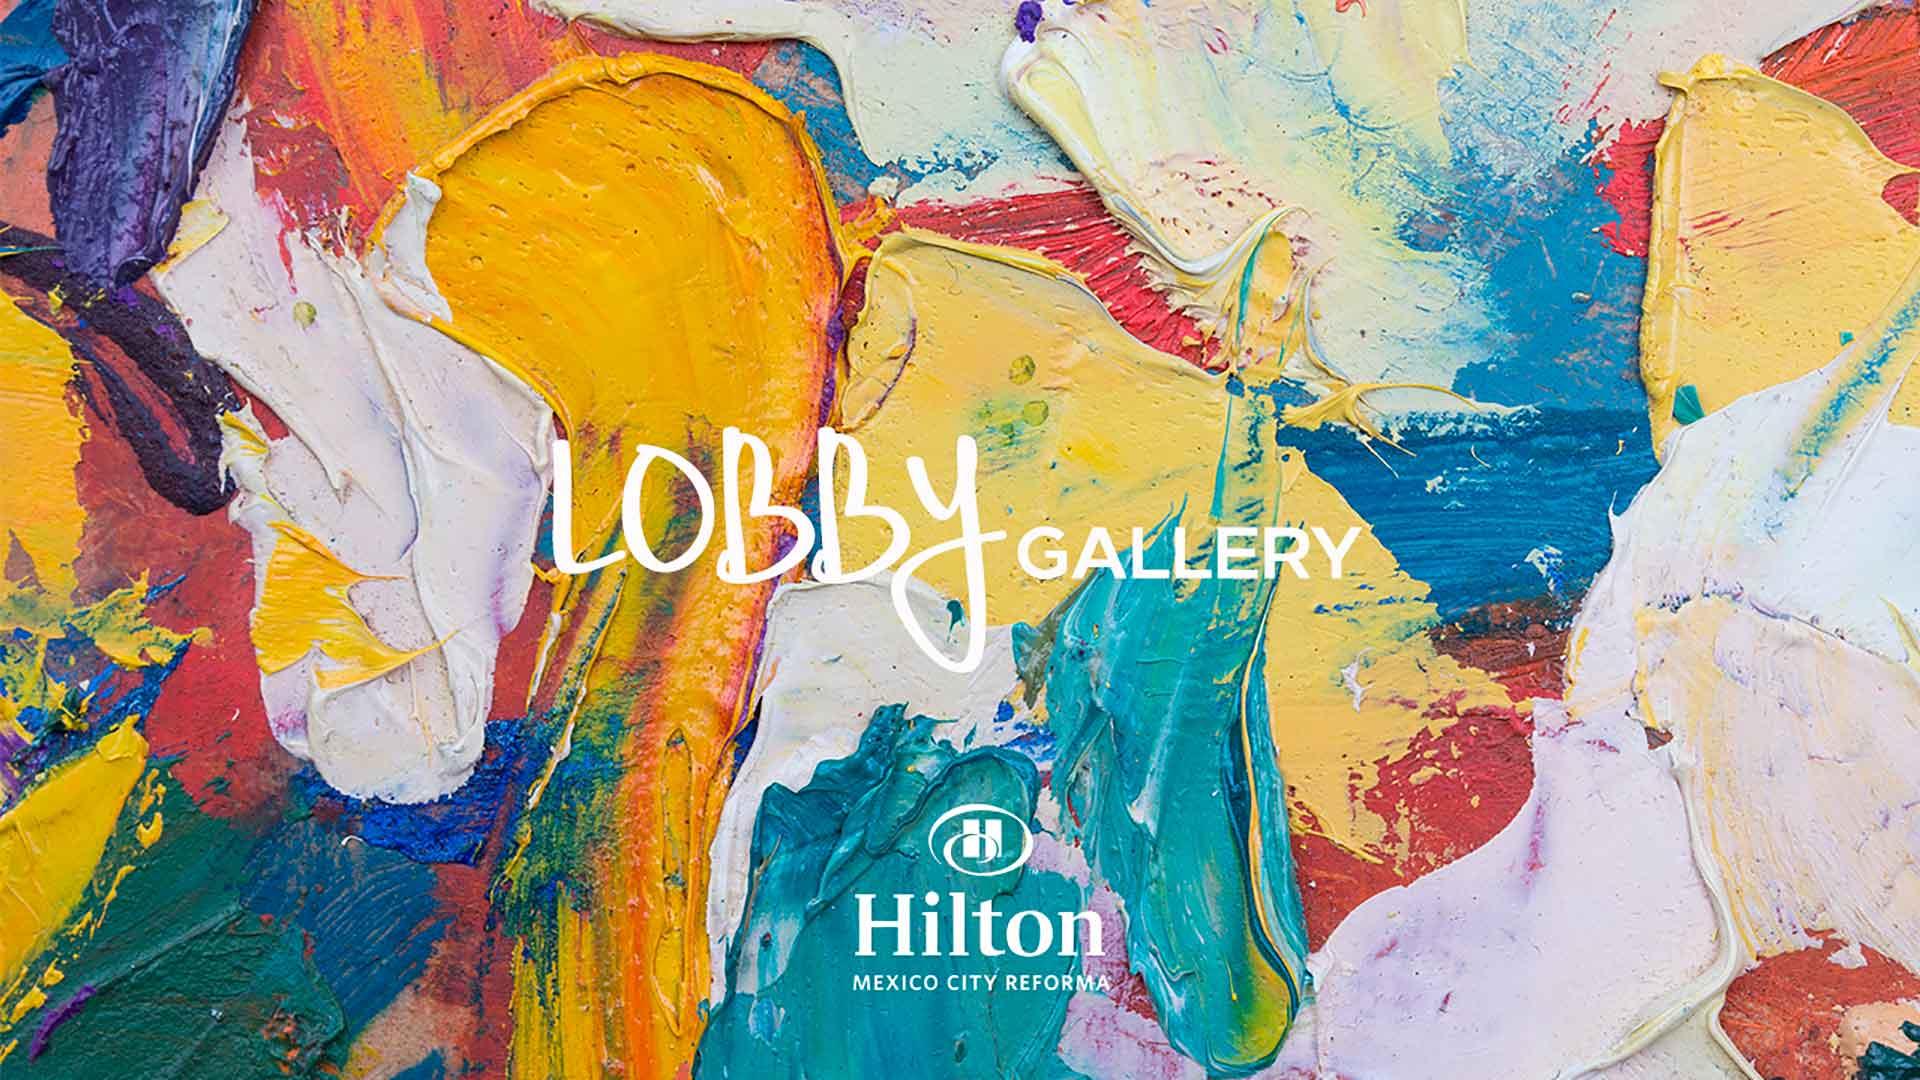 Lobby Gallery Hilton